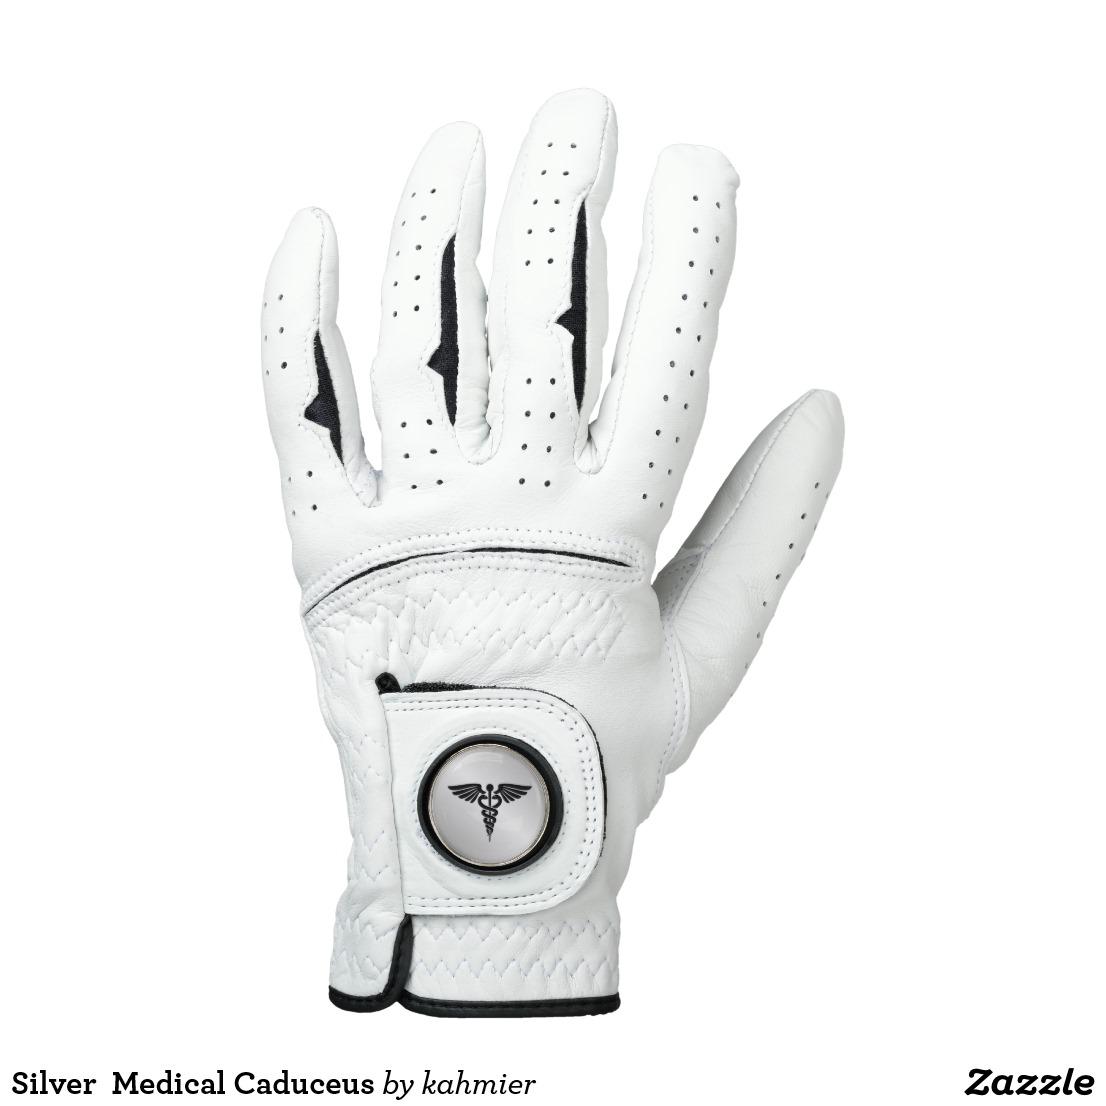 Silver Medical Caduceus Golf Glove